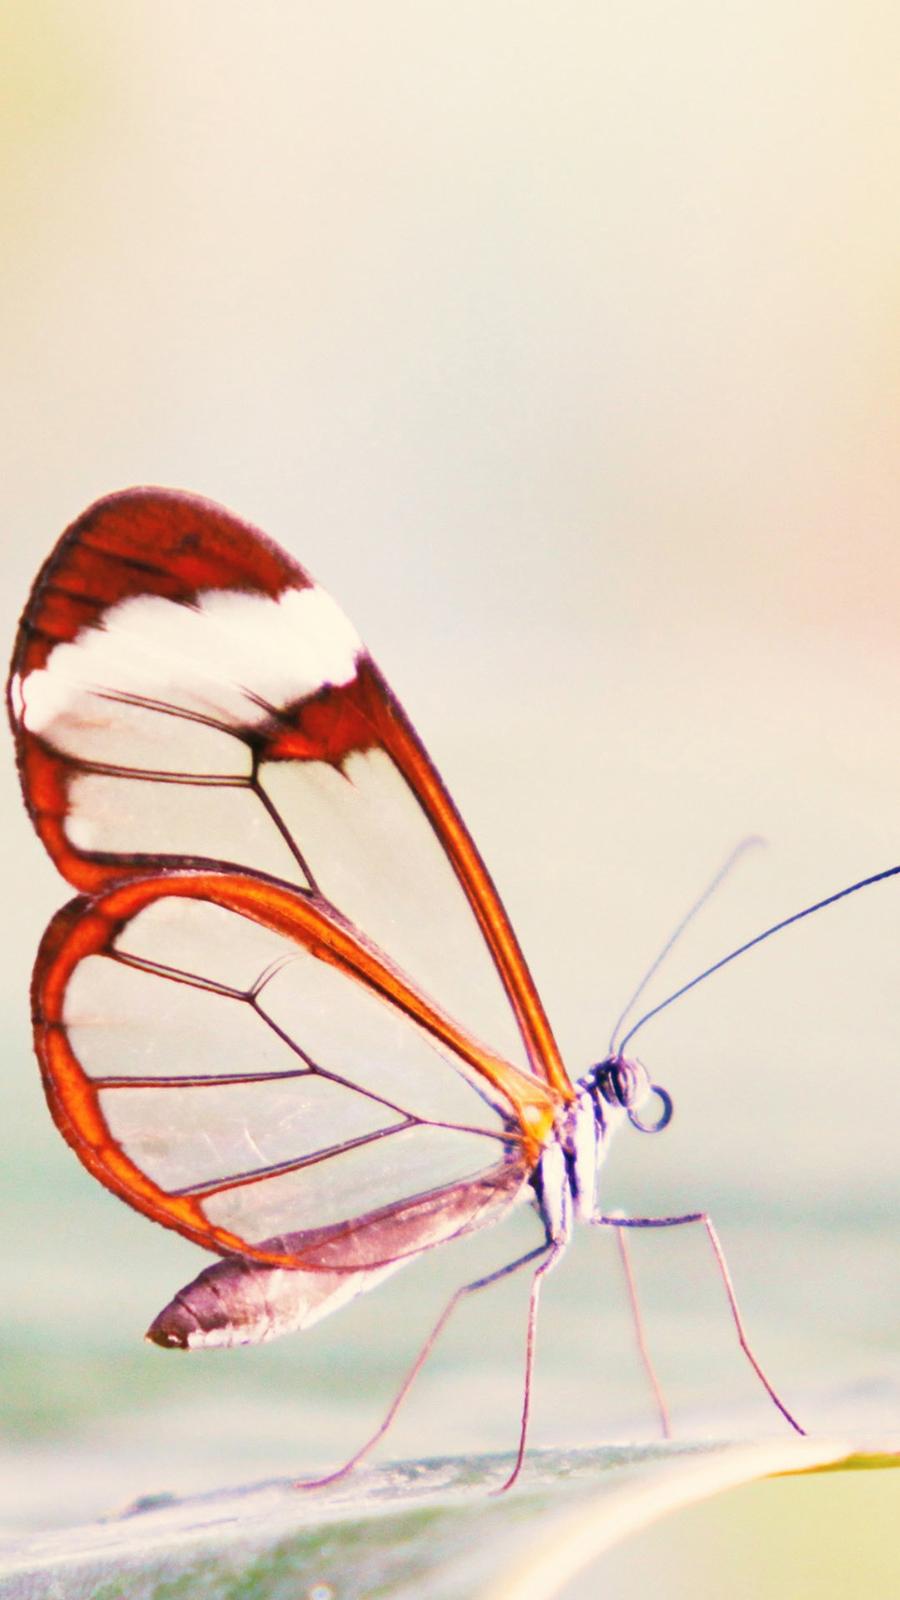 Cute Butterfly 4K Wallpapers Free Download